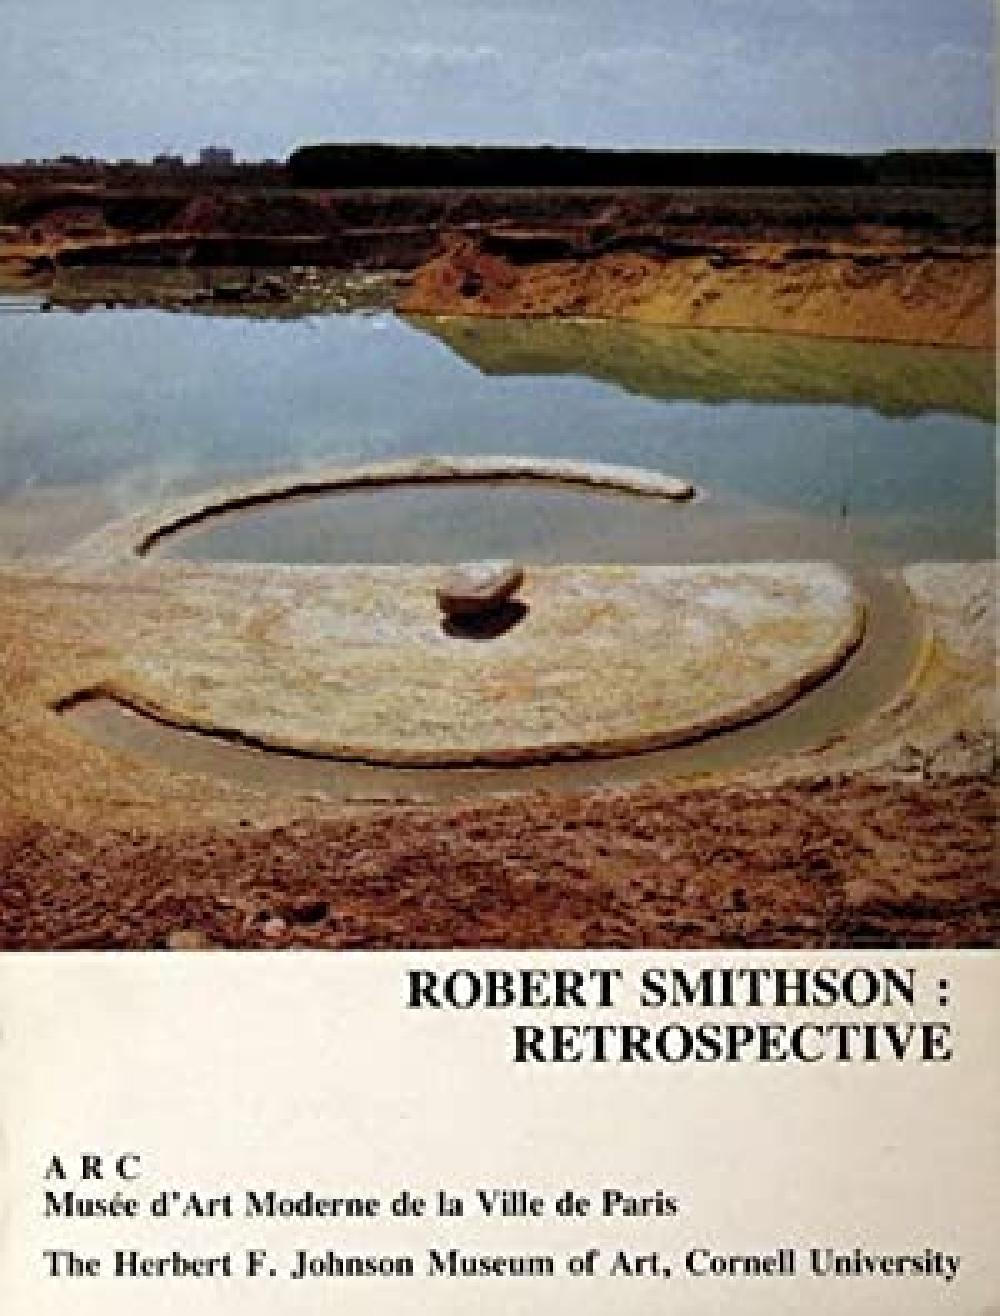 Robert Smithson: Rétropective